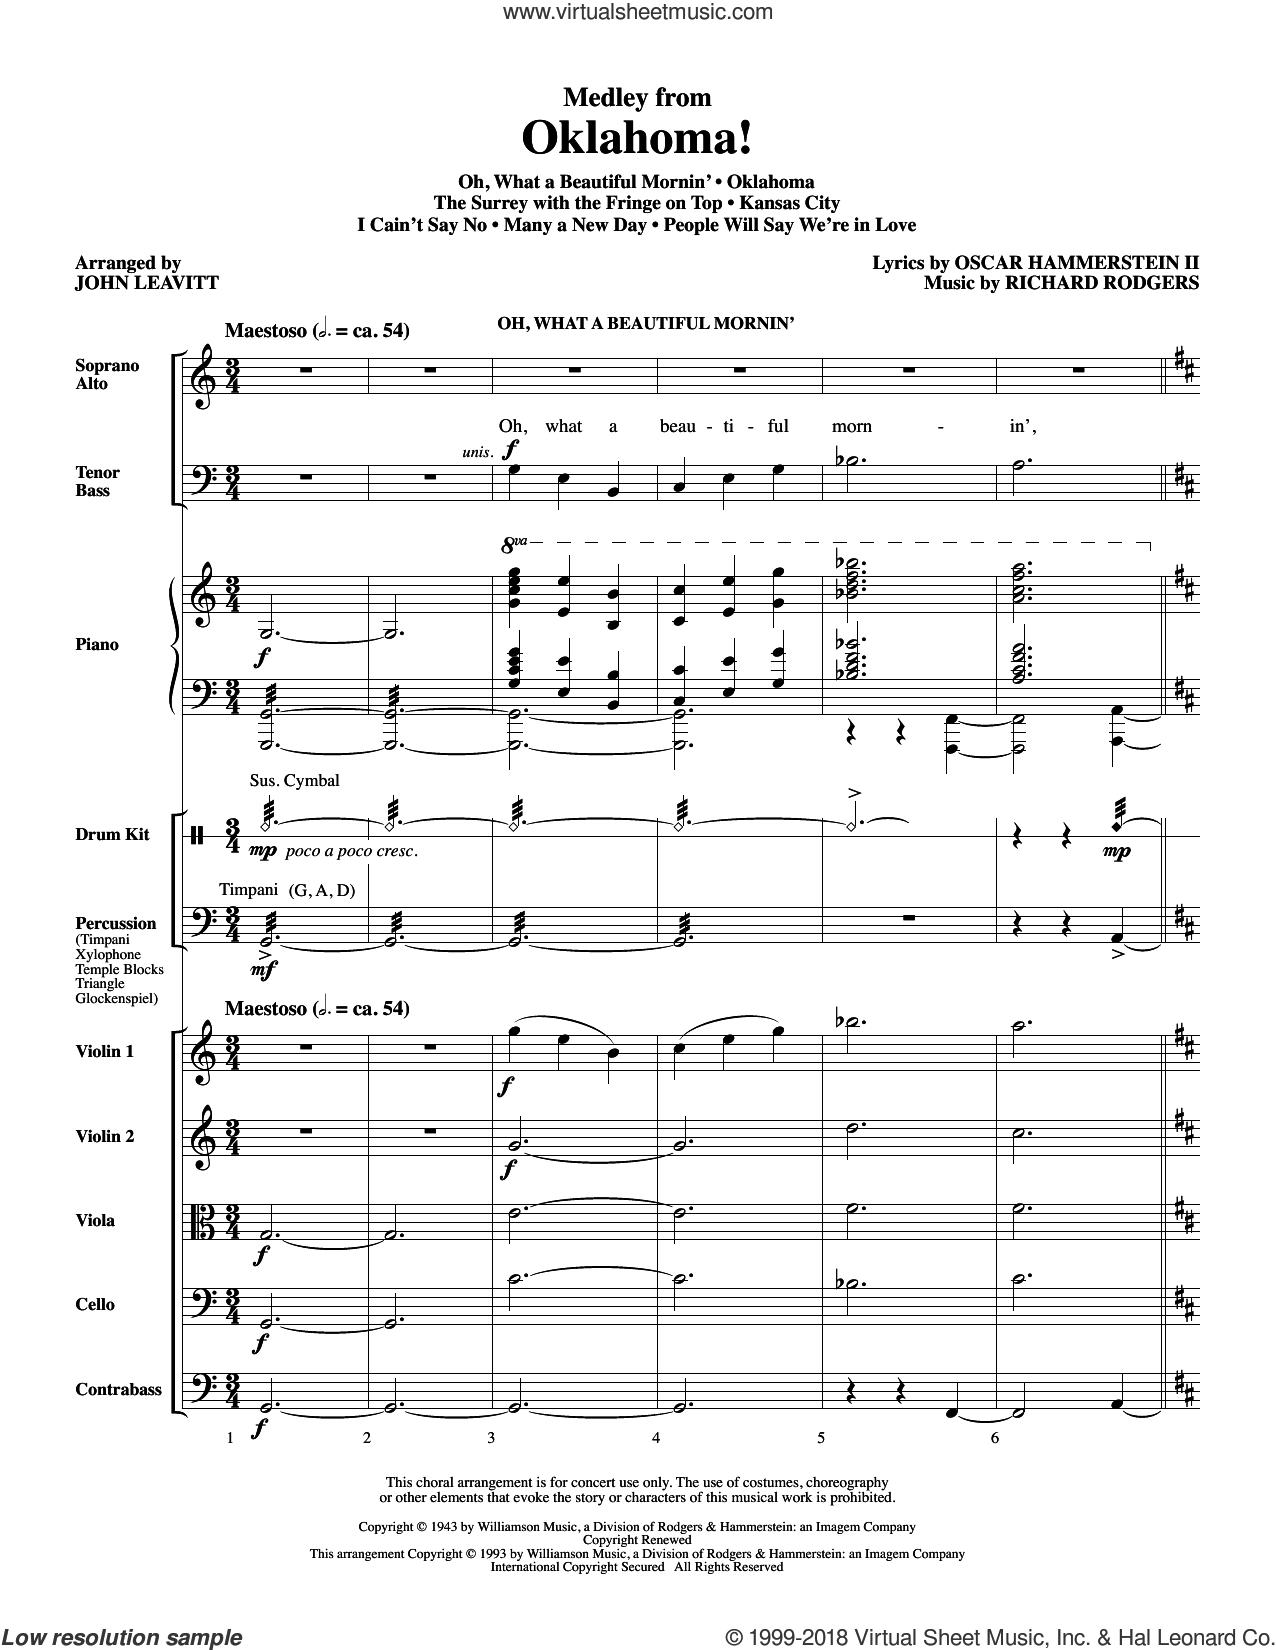 Oklahoma! (Medley) (arr. John Leavitt) (COMPLETE) sheet music for orchestra/band by Richard Rodgers, John Leavitt, Oscar II Hammerstein and Rodgers & Hammerstein, intermediate skill level